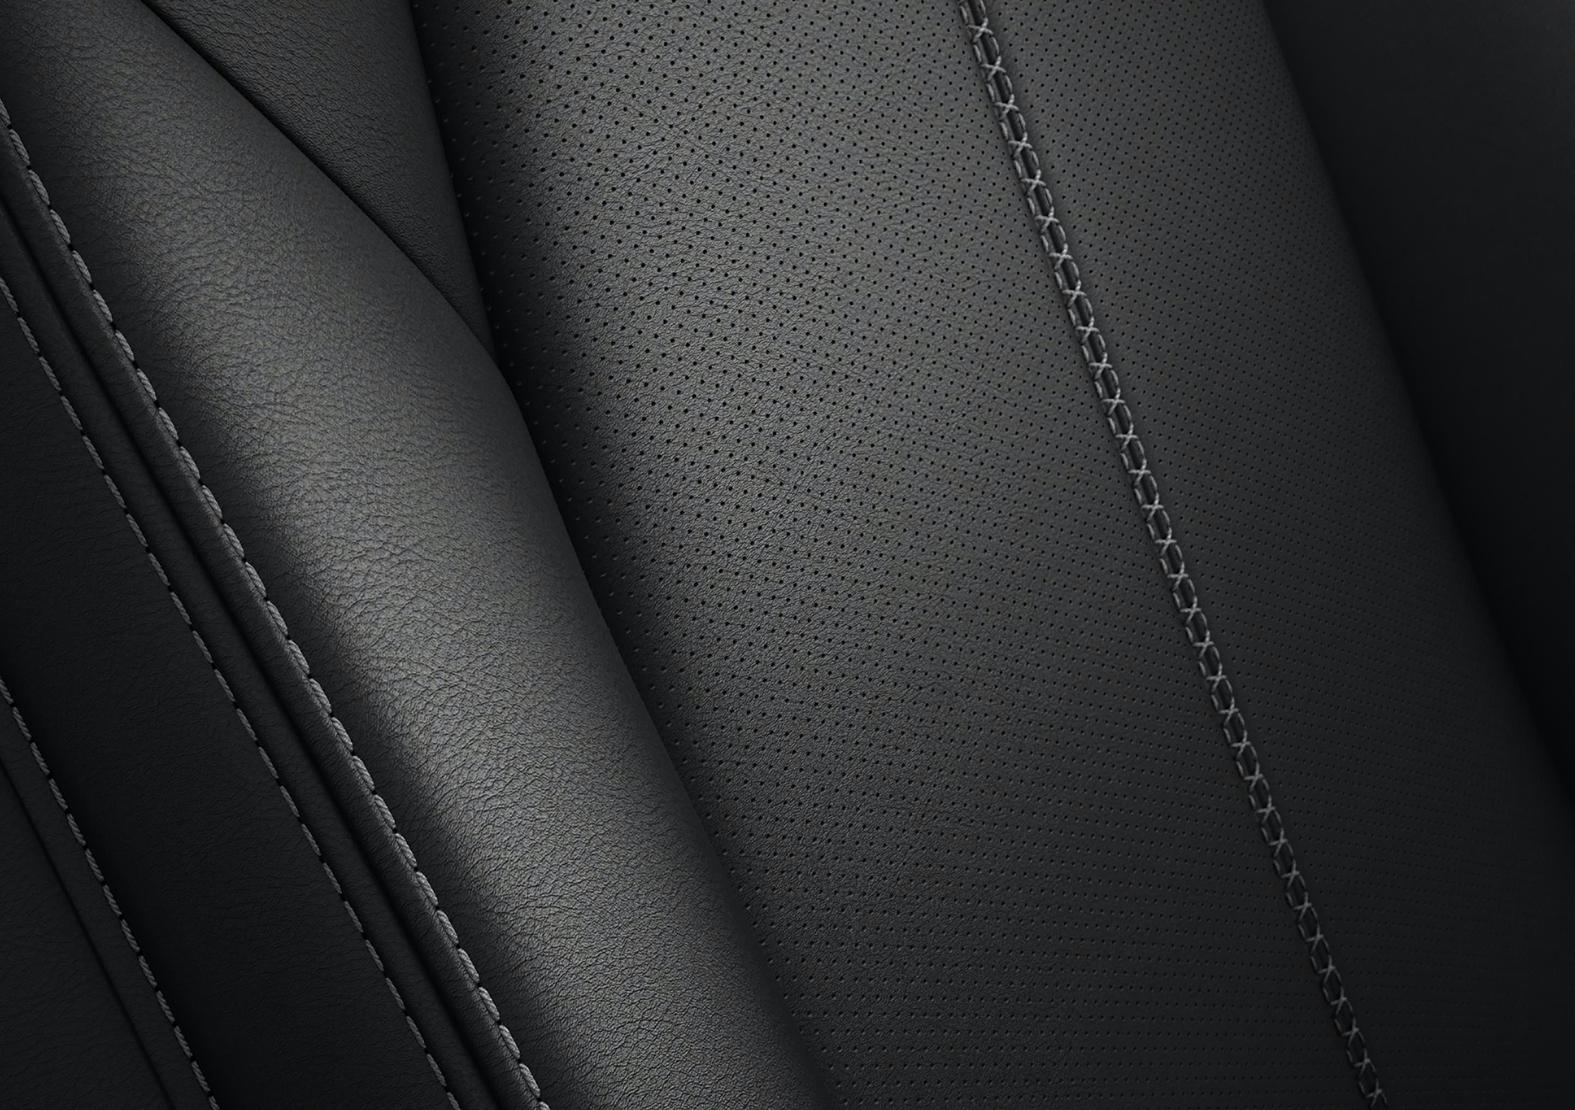 Mazda-MX-5-and-CX-5-2020-7